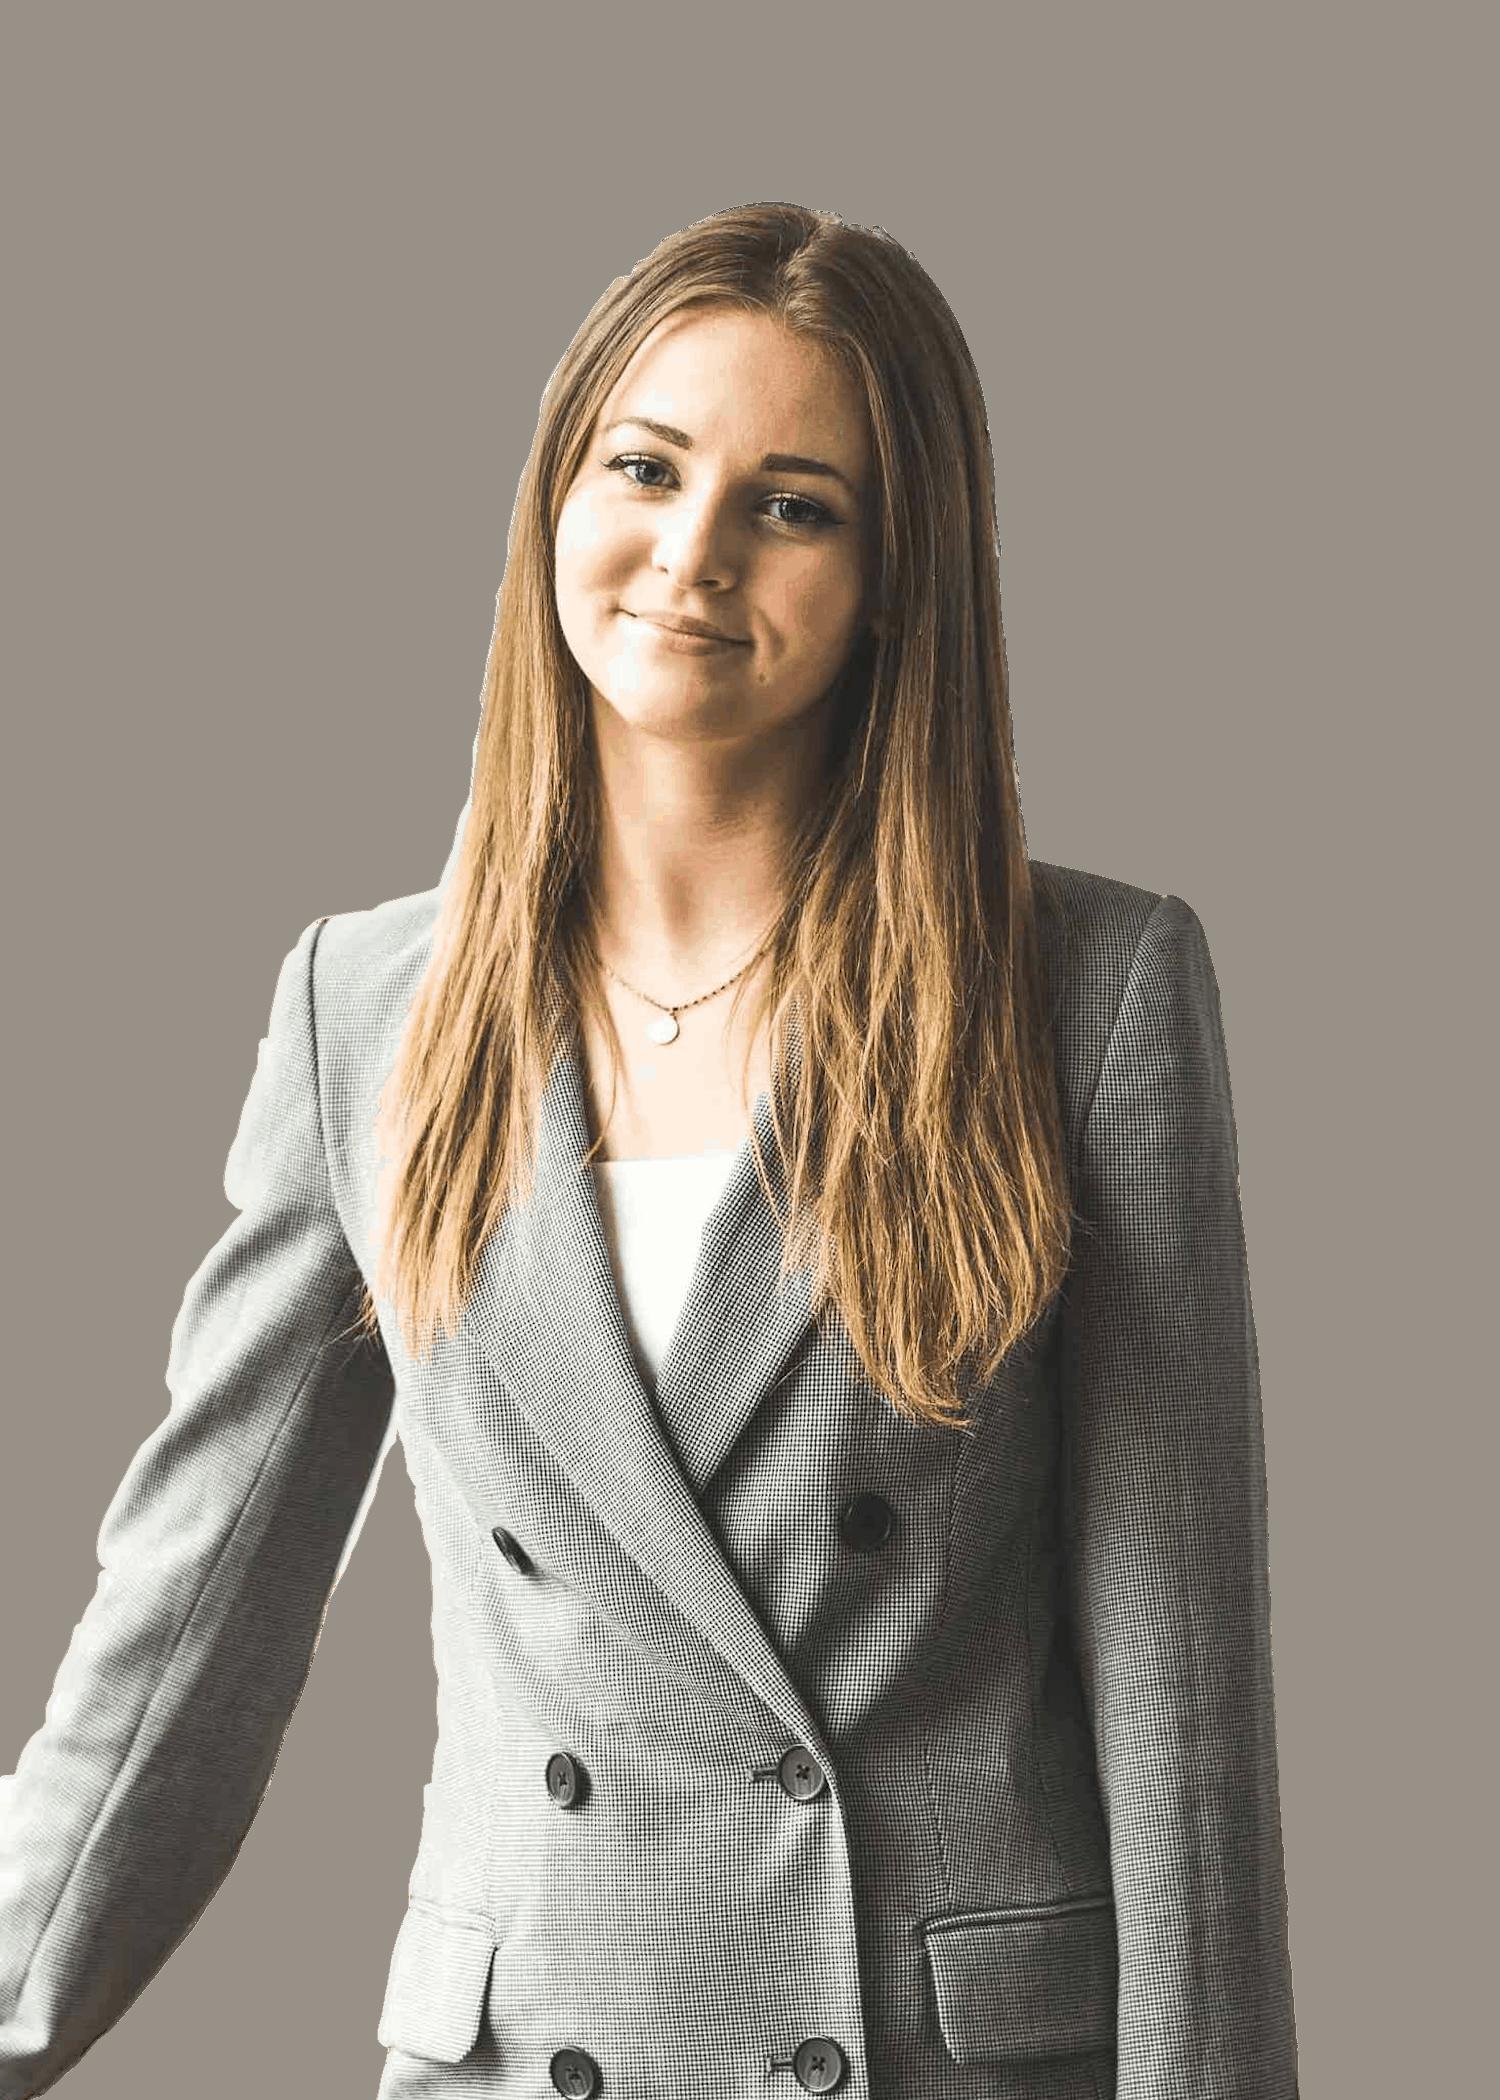 Kristine Brandle